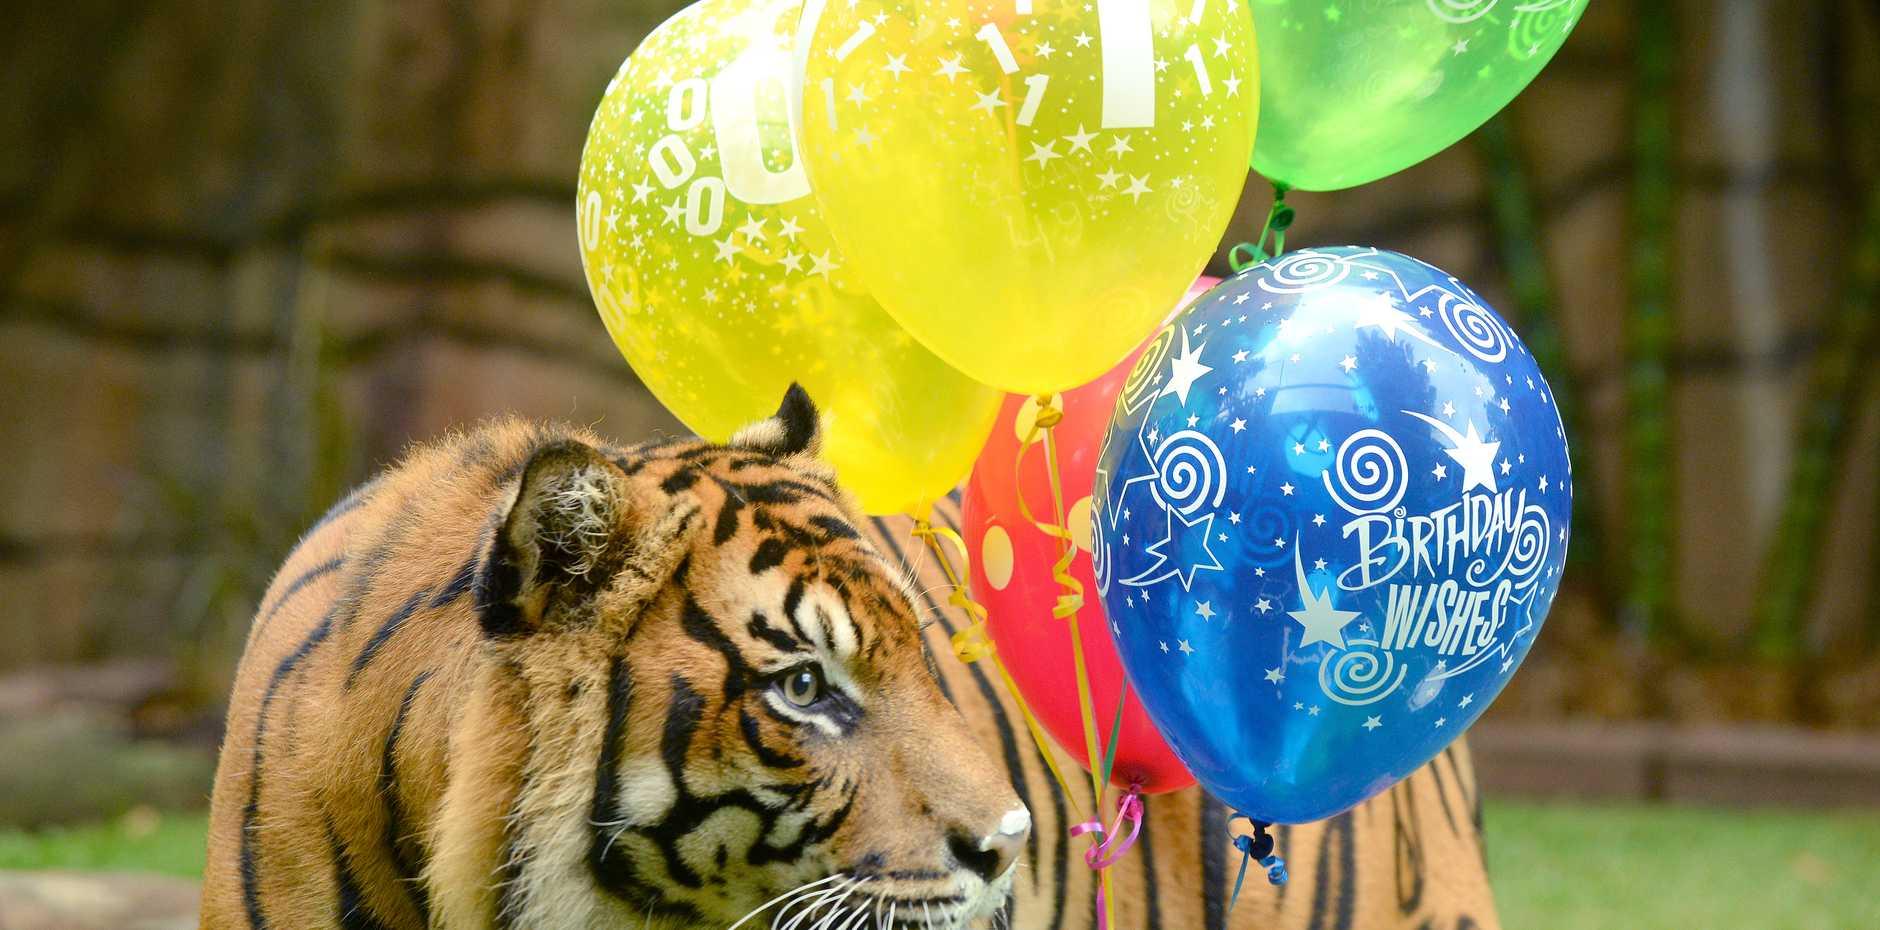 Australia Zoo's 10-ear-old tiger Juma earlier this year